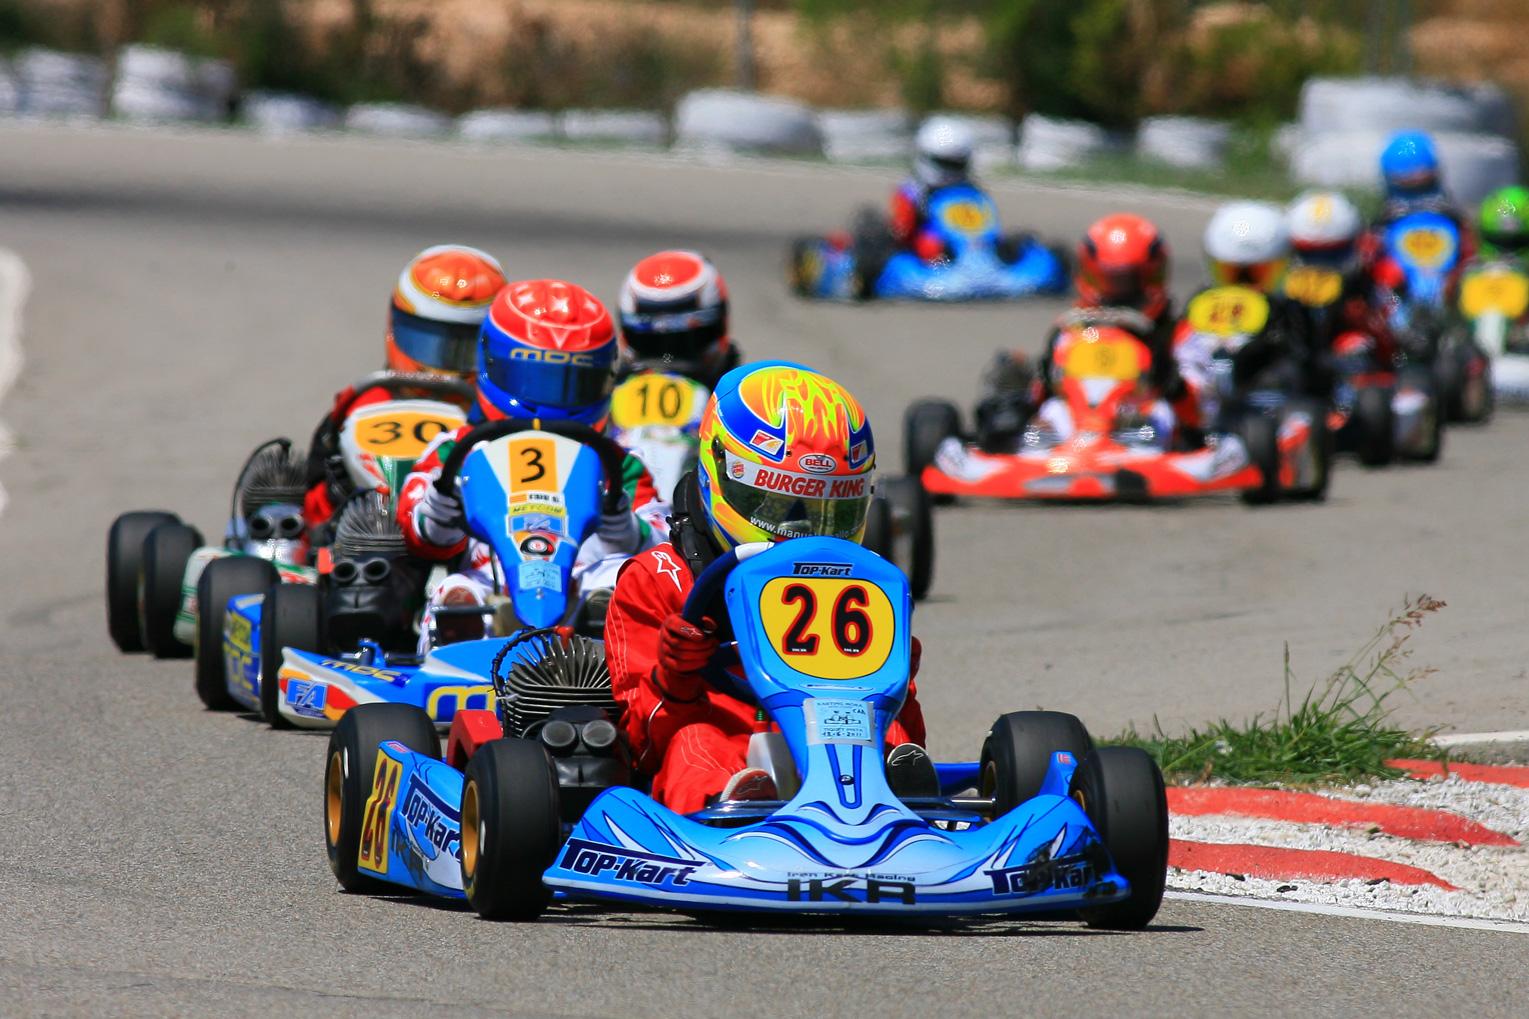 benferri karting club campeonato valenciano de karting 3 prueba circuito de albaida. Black Bedroom Furniture Sets. Home Design Ideas